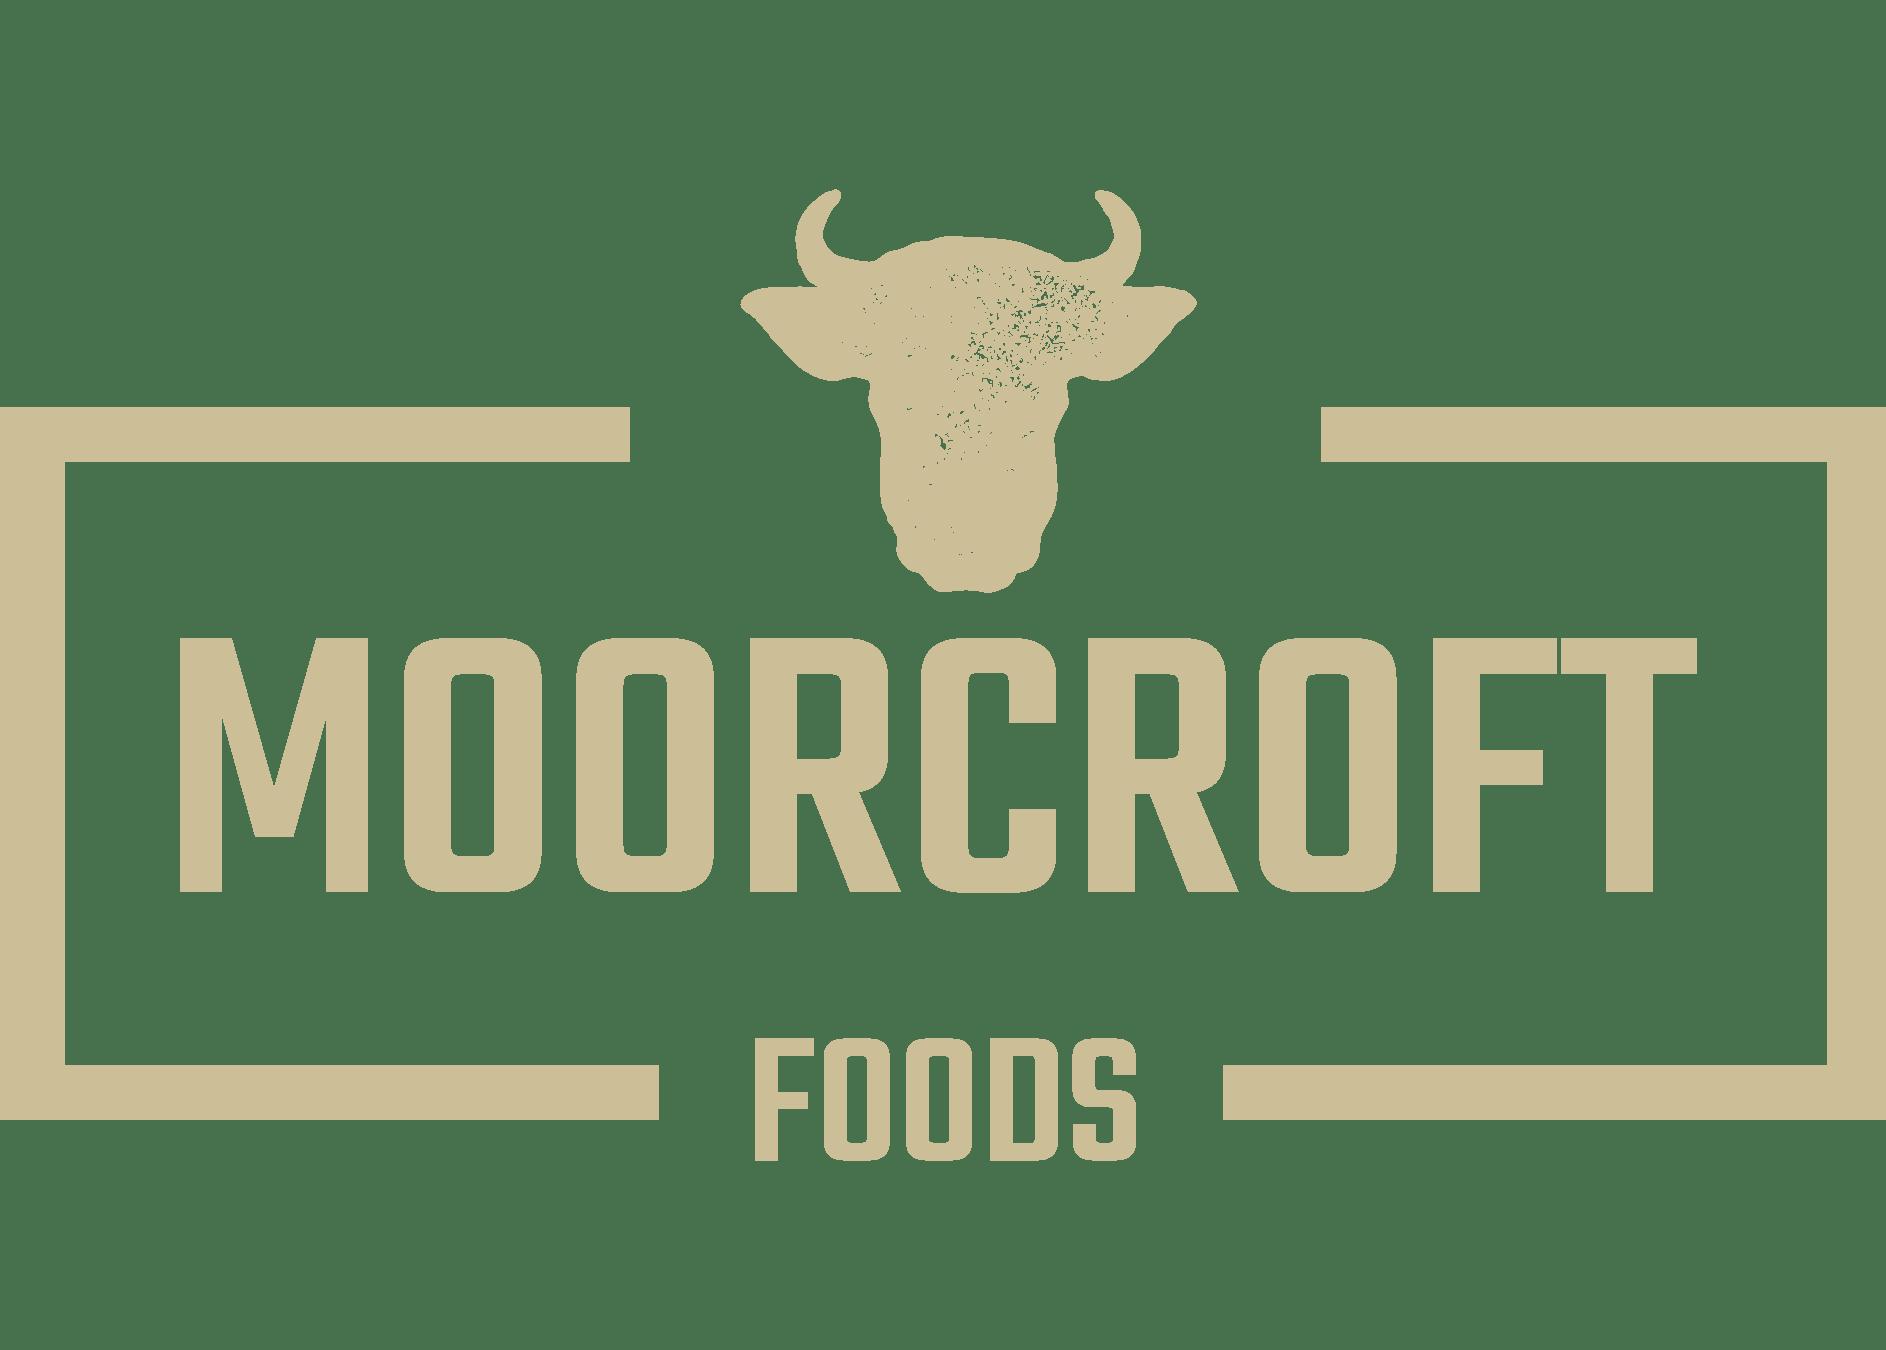 Moorcroft Beige PNG